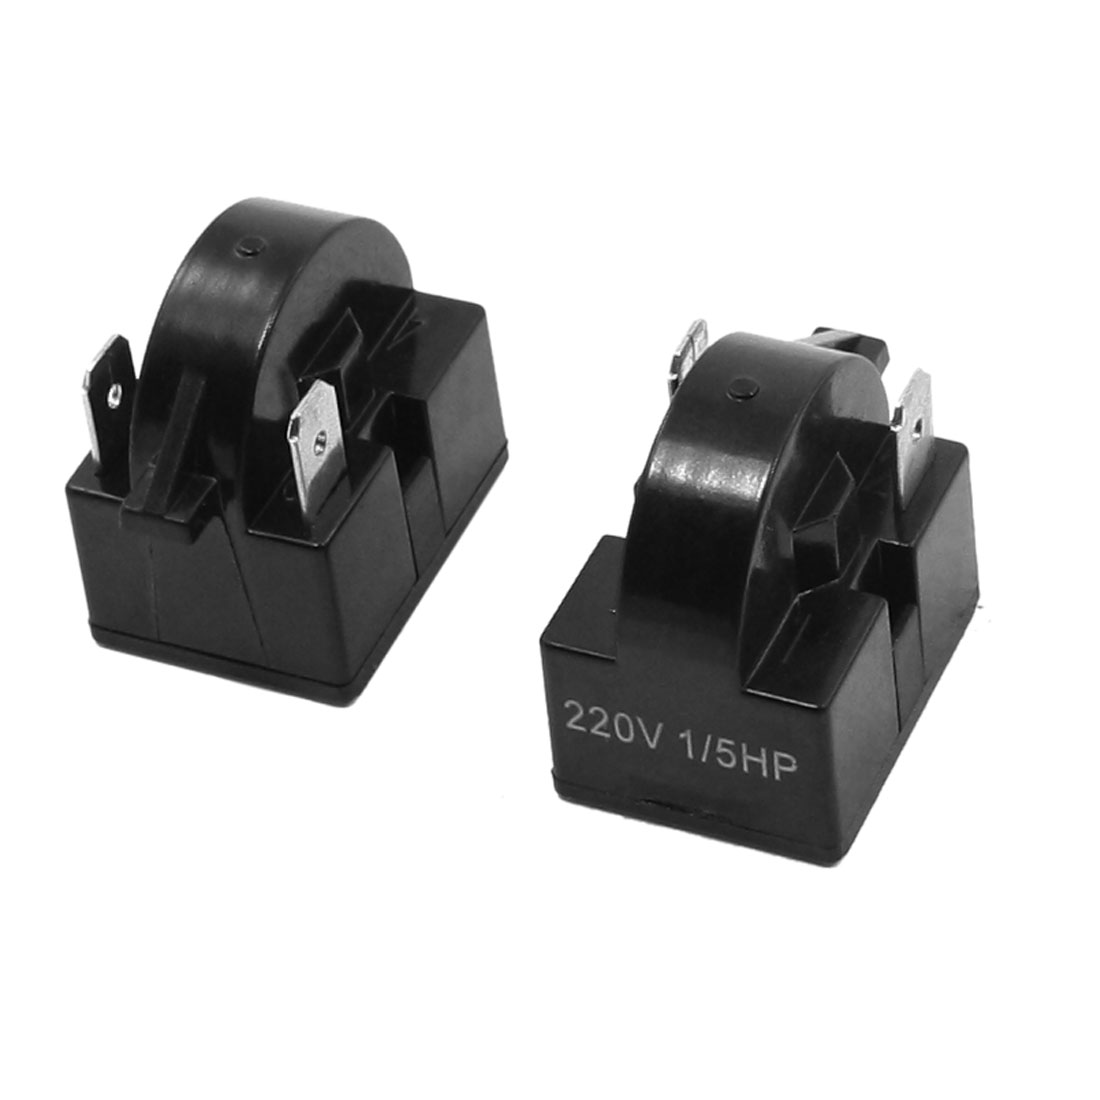 2 Pcs 1/5 HP Refrigerator Black Plastic Shell 220V PTC Starter Relay